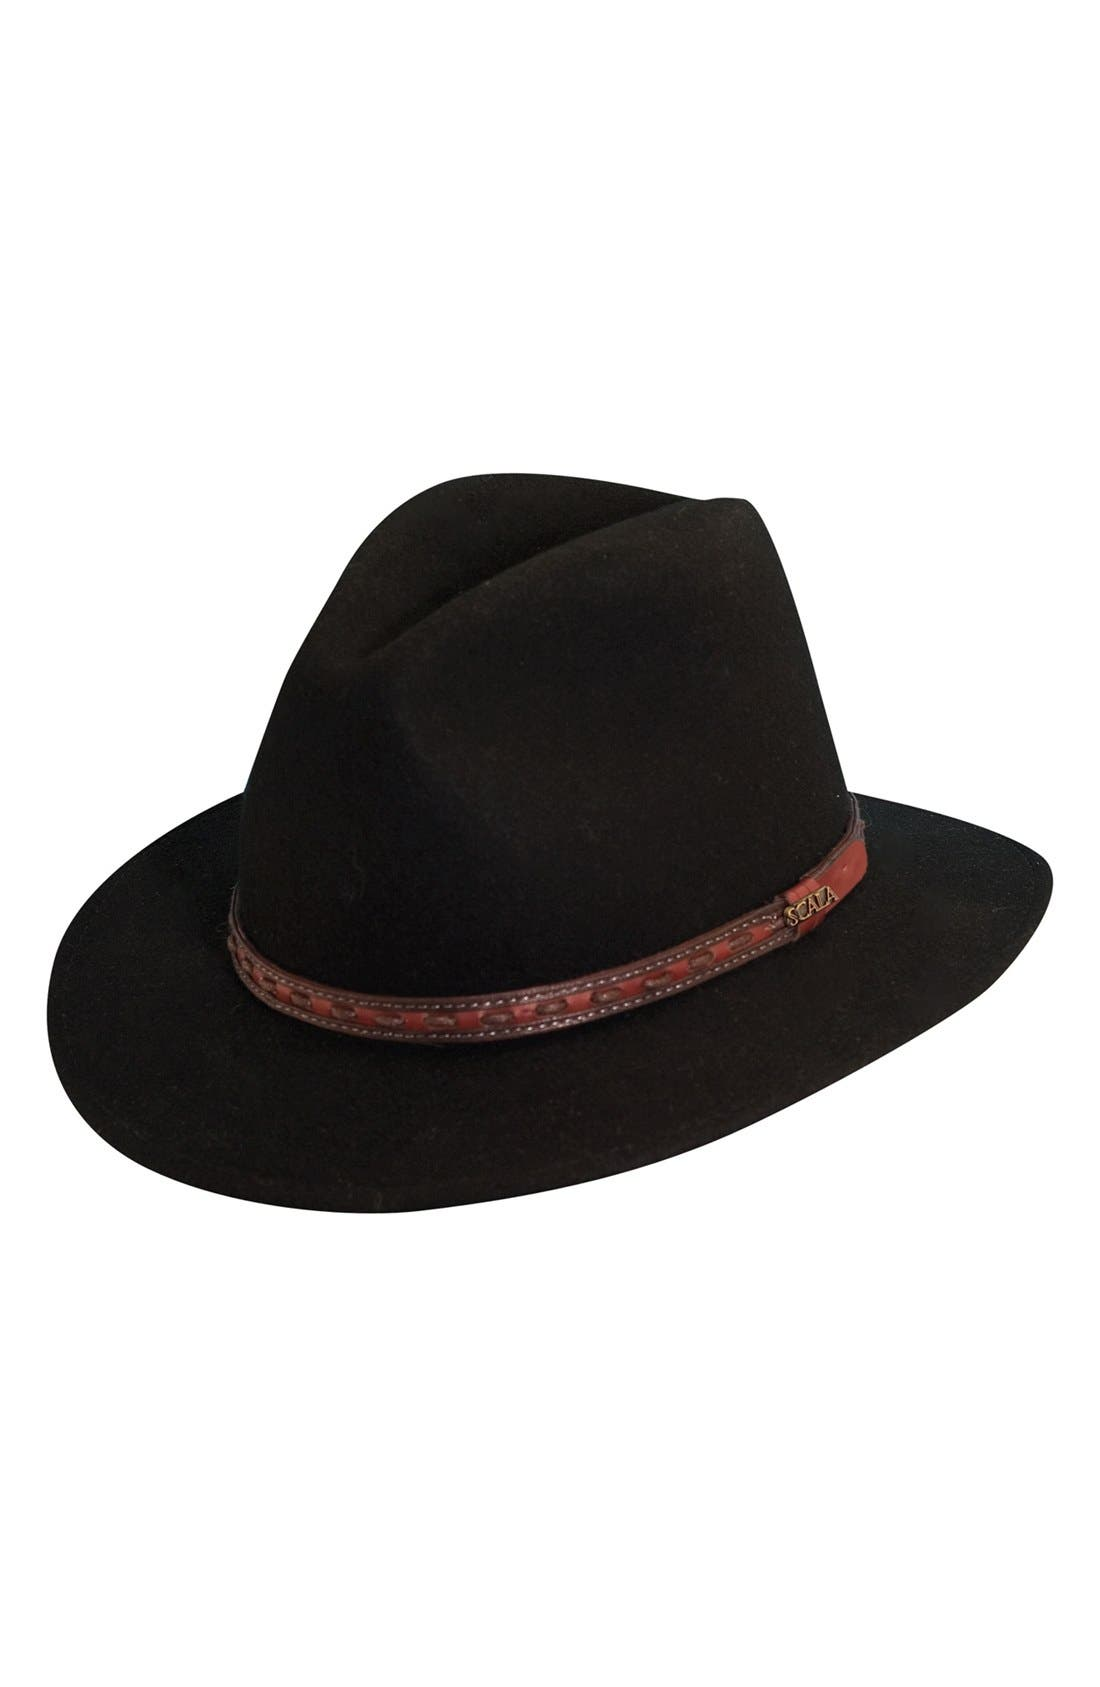 Main Image - Scala 'Classico' Crushable Felt Safari Hat